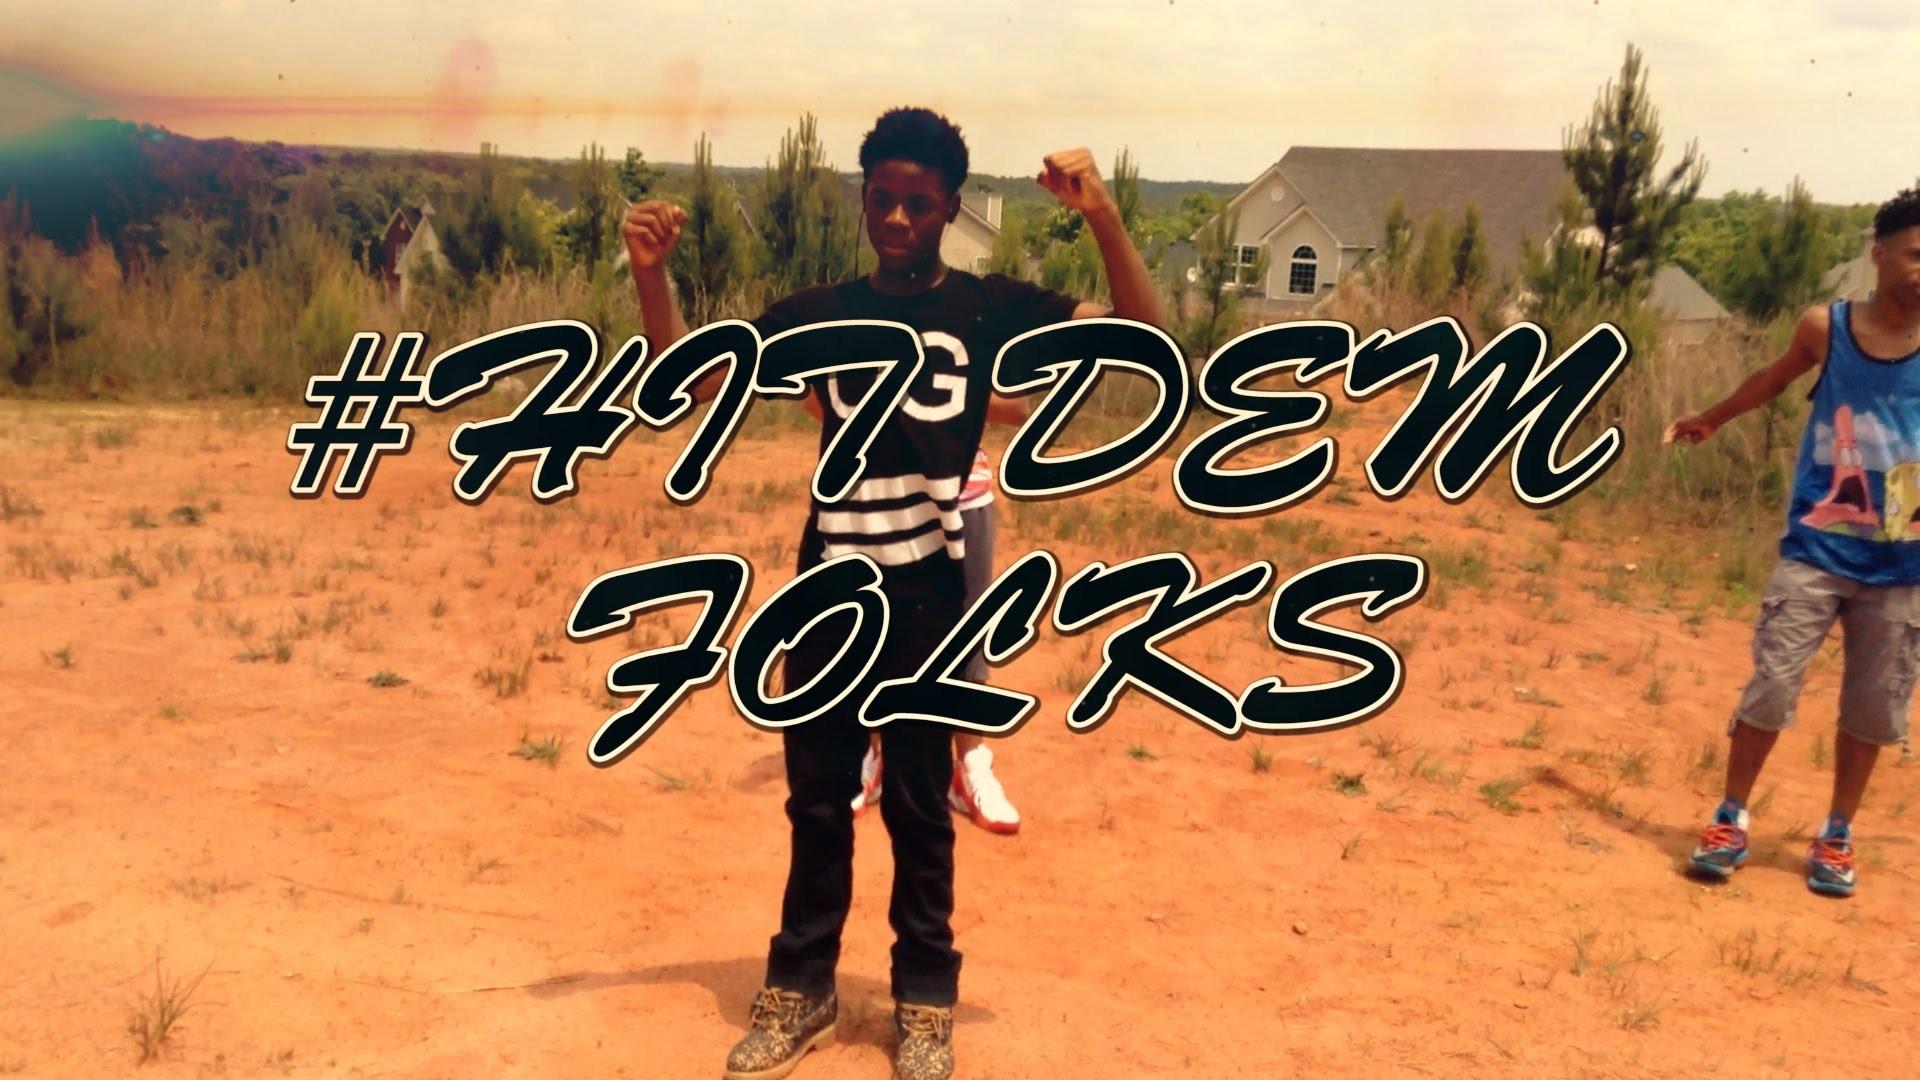 Hit Dem Folks Official Dance Video #Hitdemfolks (Music Video) drop dance  Lil Donald – Juice – YouTube